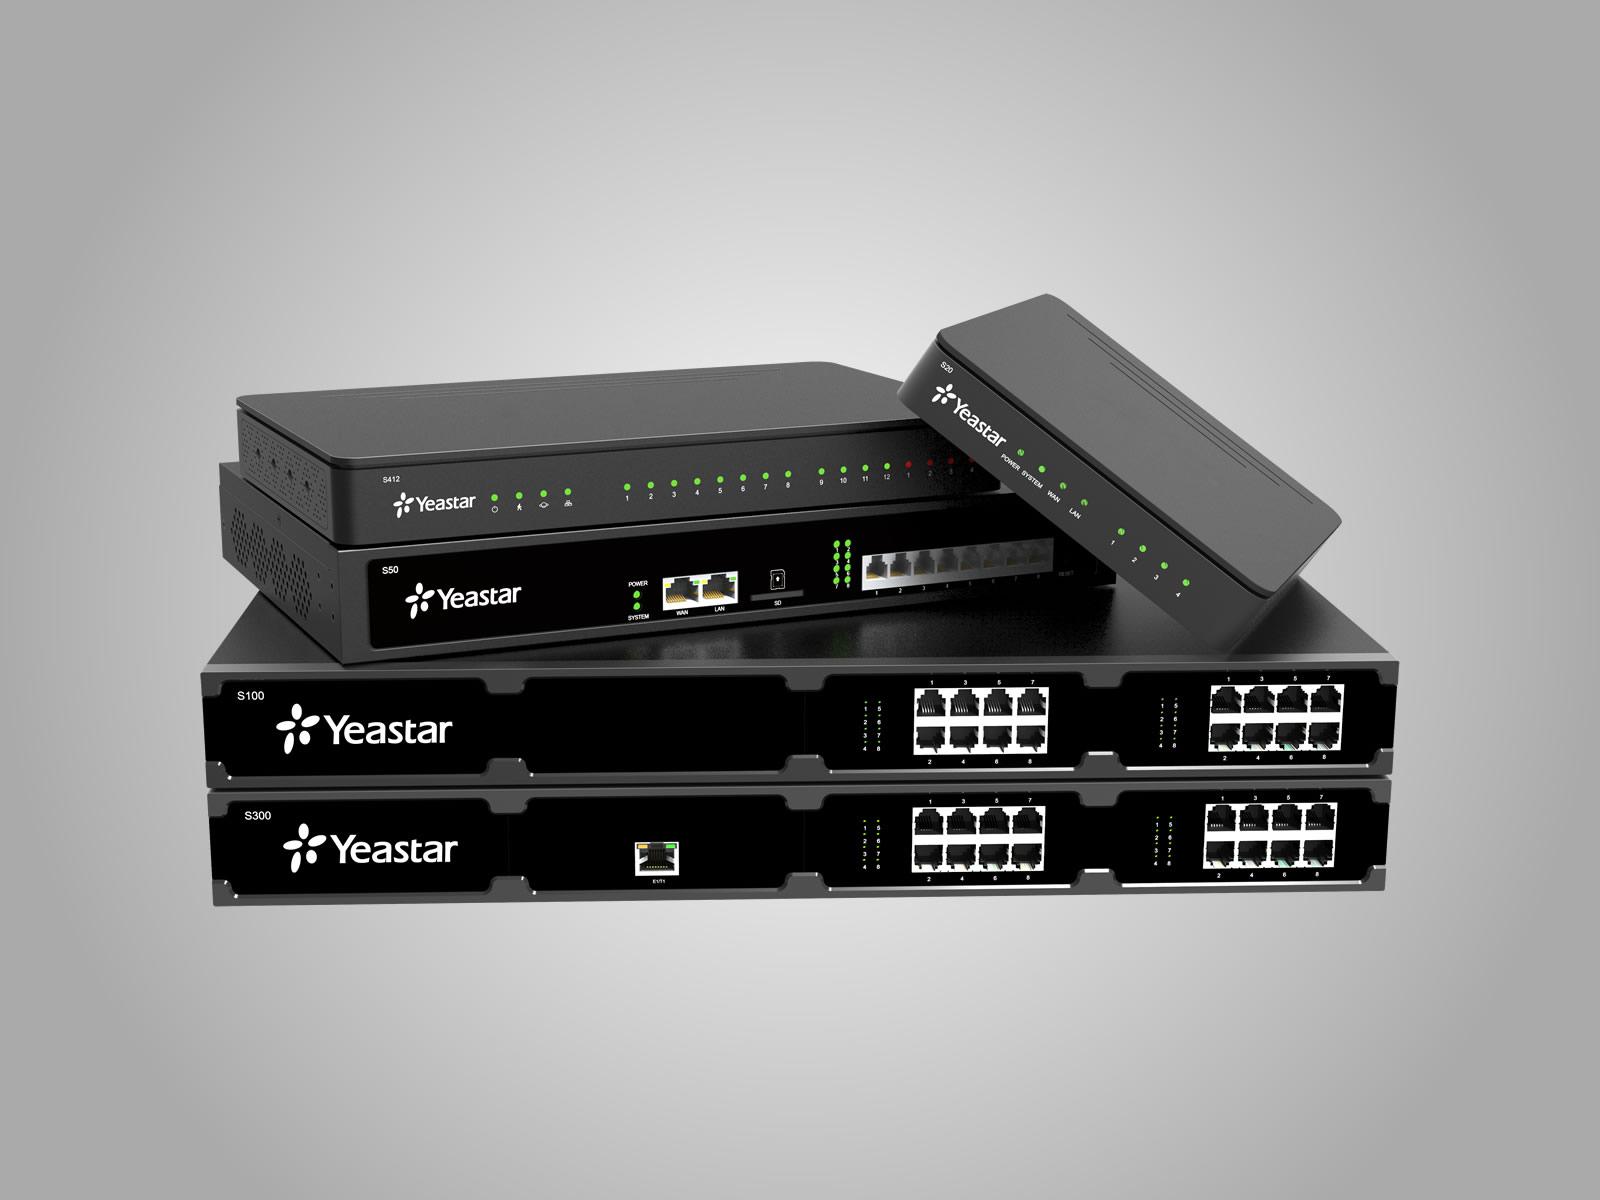 Yeastar S-Serisi Telefon Santral Modelleri